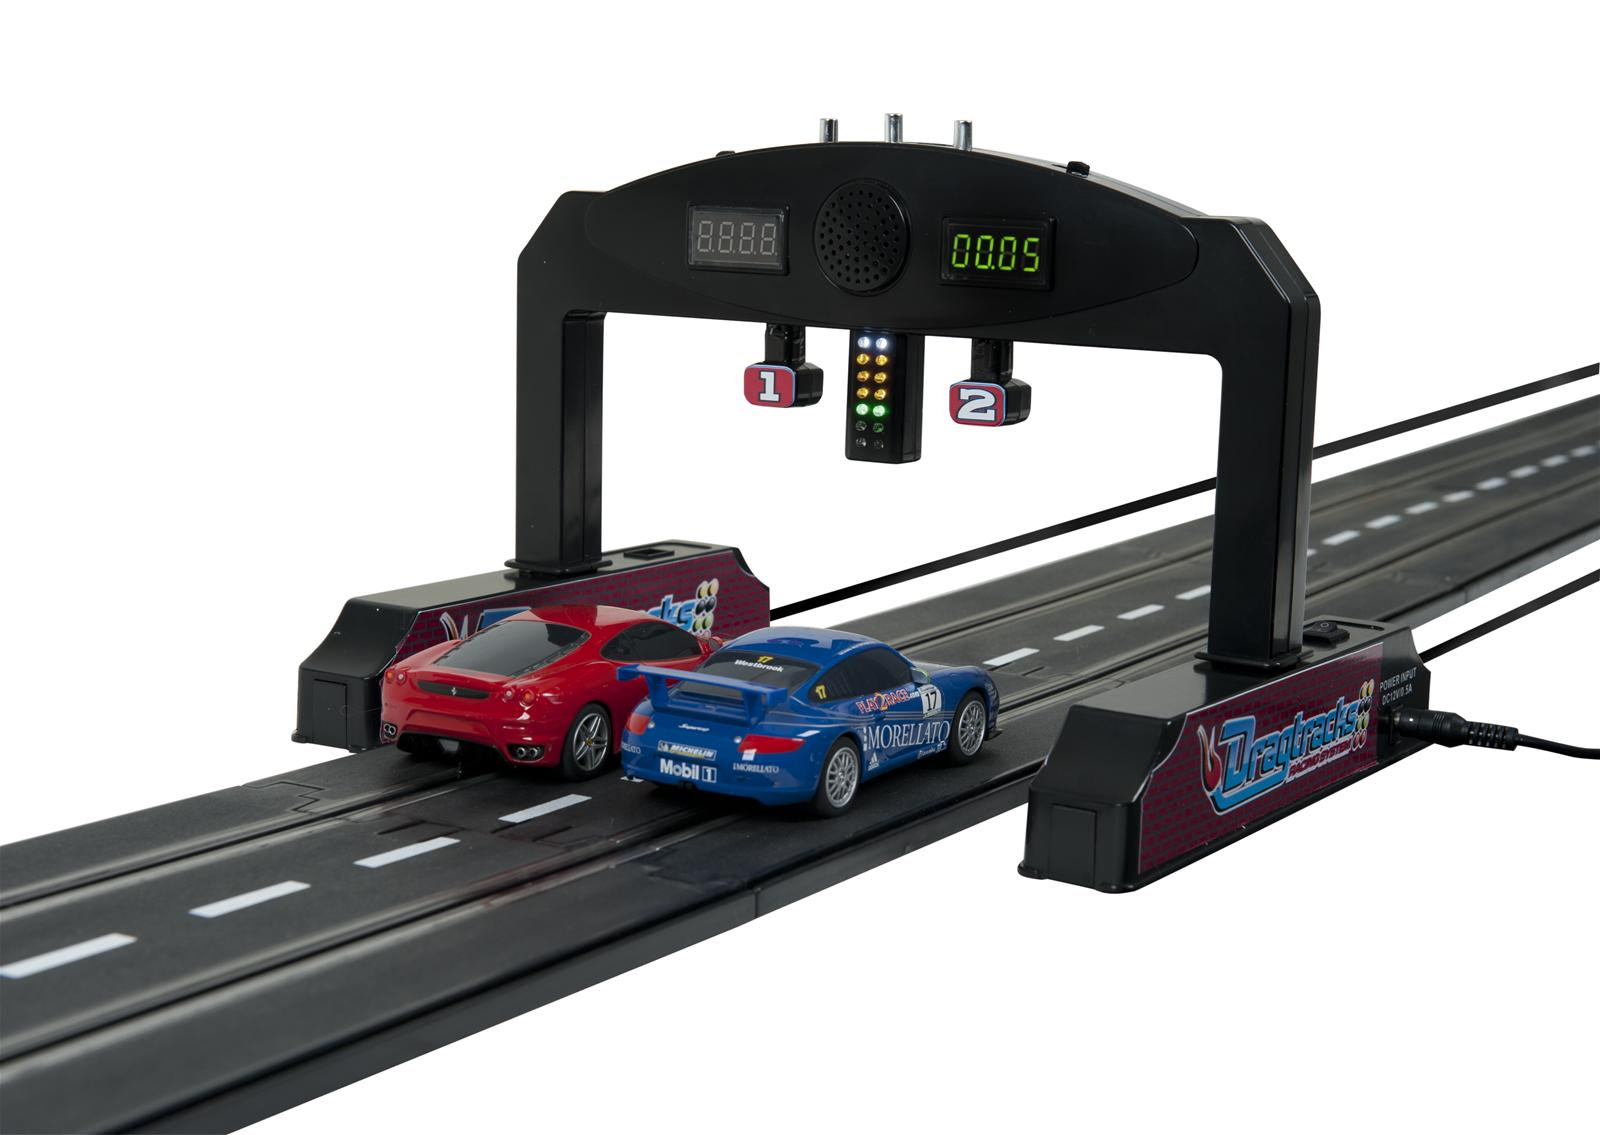 9/7/ · Buena Park Raceway – Lincoln Ave.Buena Park, Ca.() Fast Track Hobbies – Lonetree Blvd Ste E, Rocklin, CA () Nomad Slot Racing – Pioneer Avenue Suite A, Vista, CA () PCH Parts Express – Wagon Wheel Rd., Oxnard, CA () SCR Hobbies Raceway – Southwest Blvd., Rohnert CA .